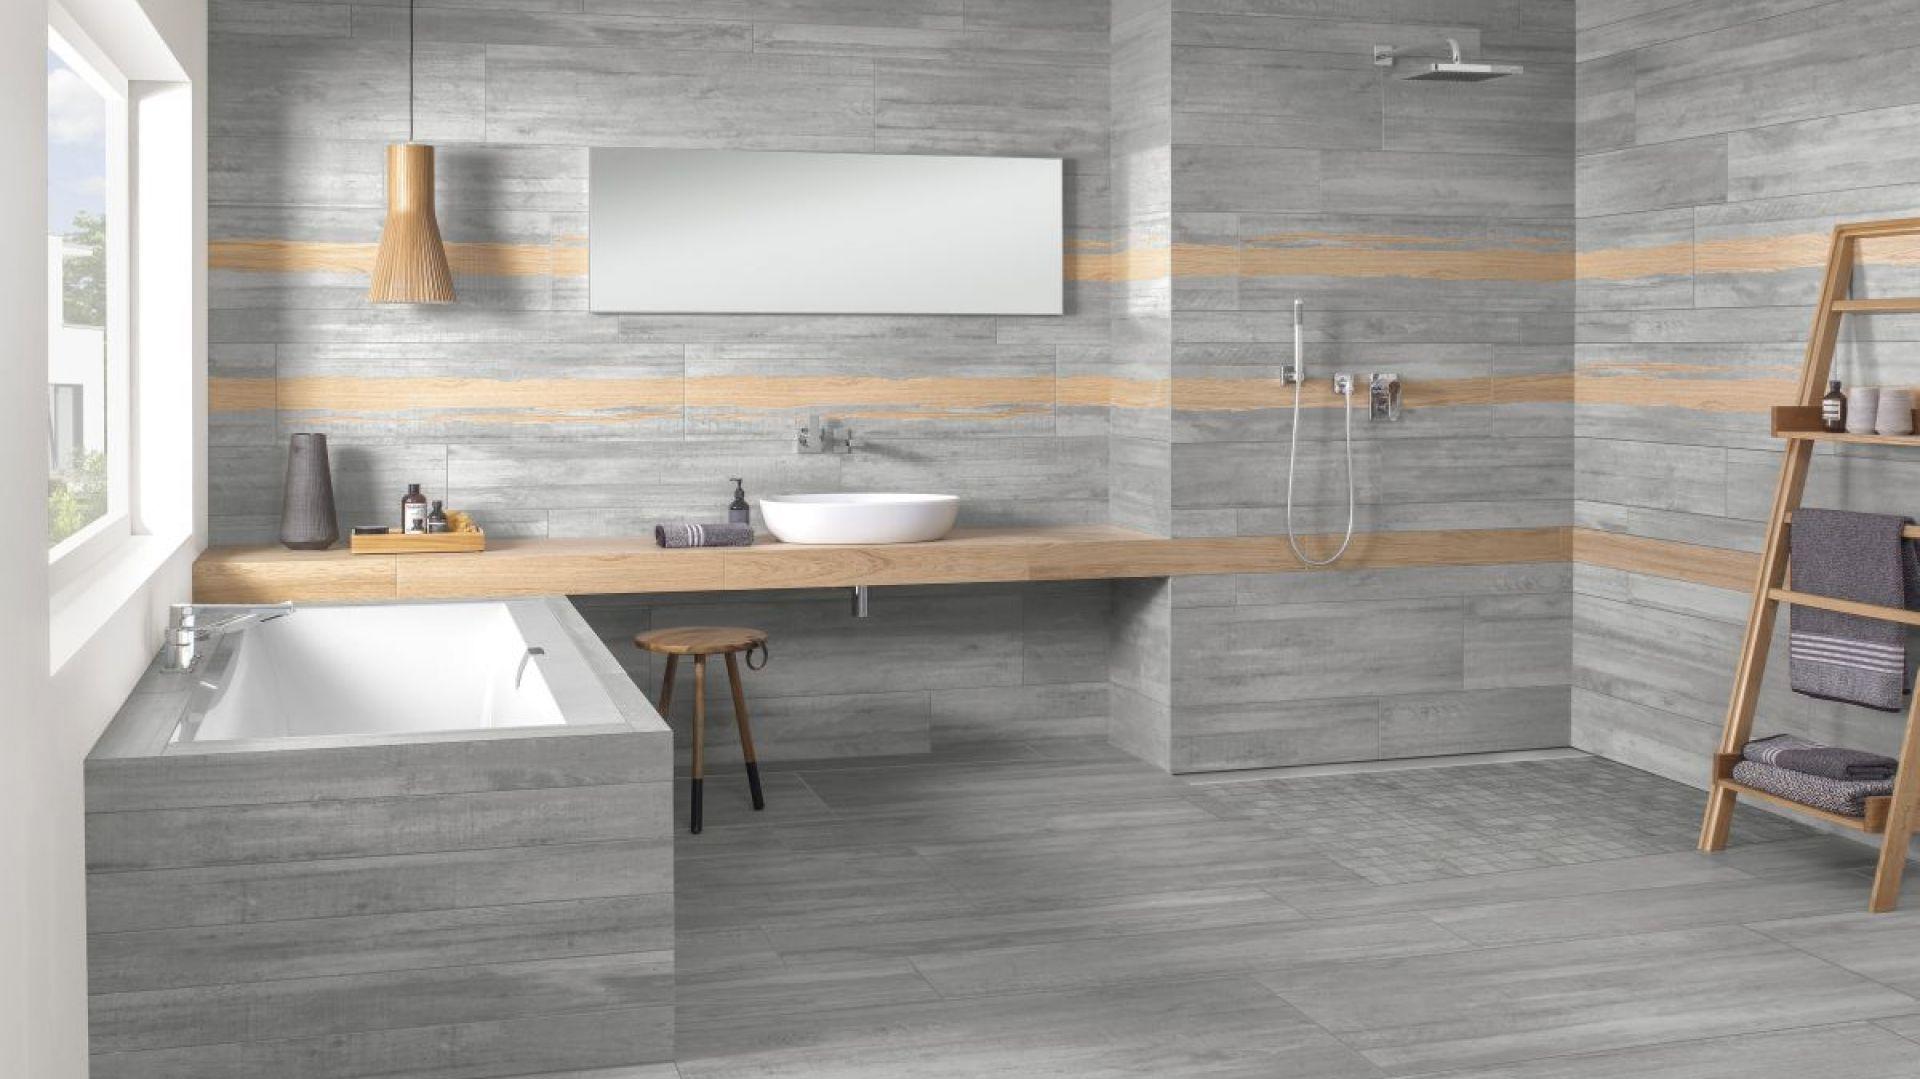 Minimalizm w łazience. Fot. Villeroy & Boch